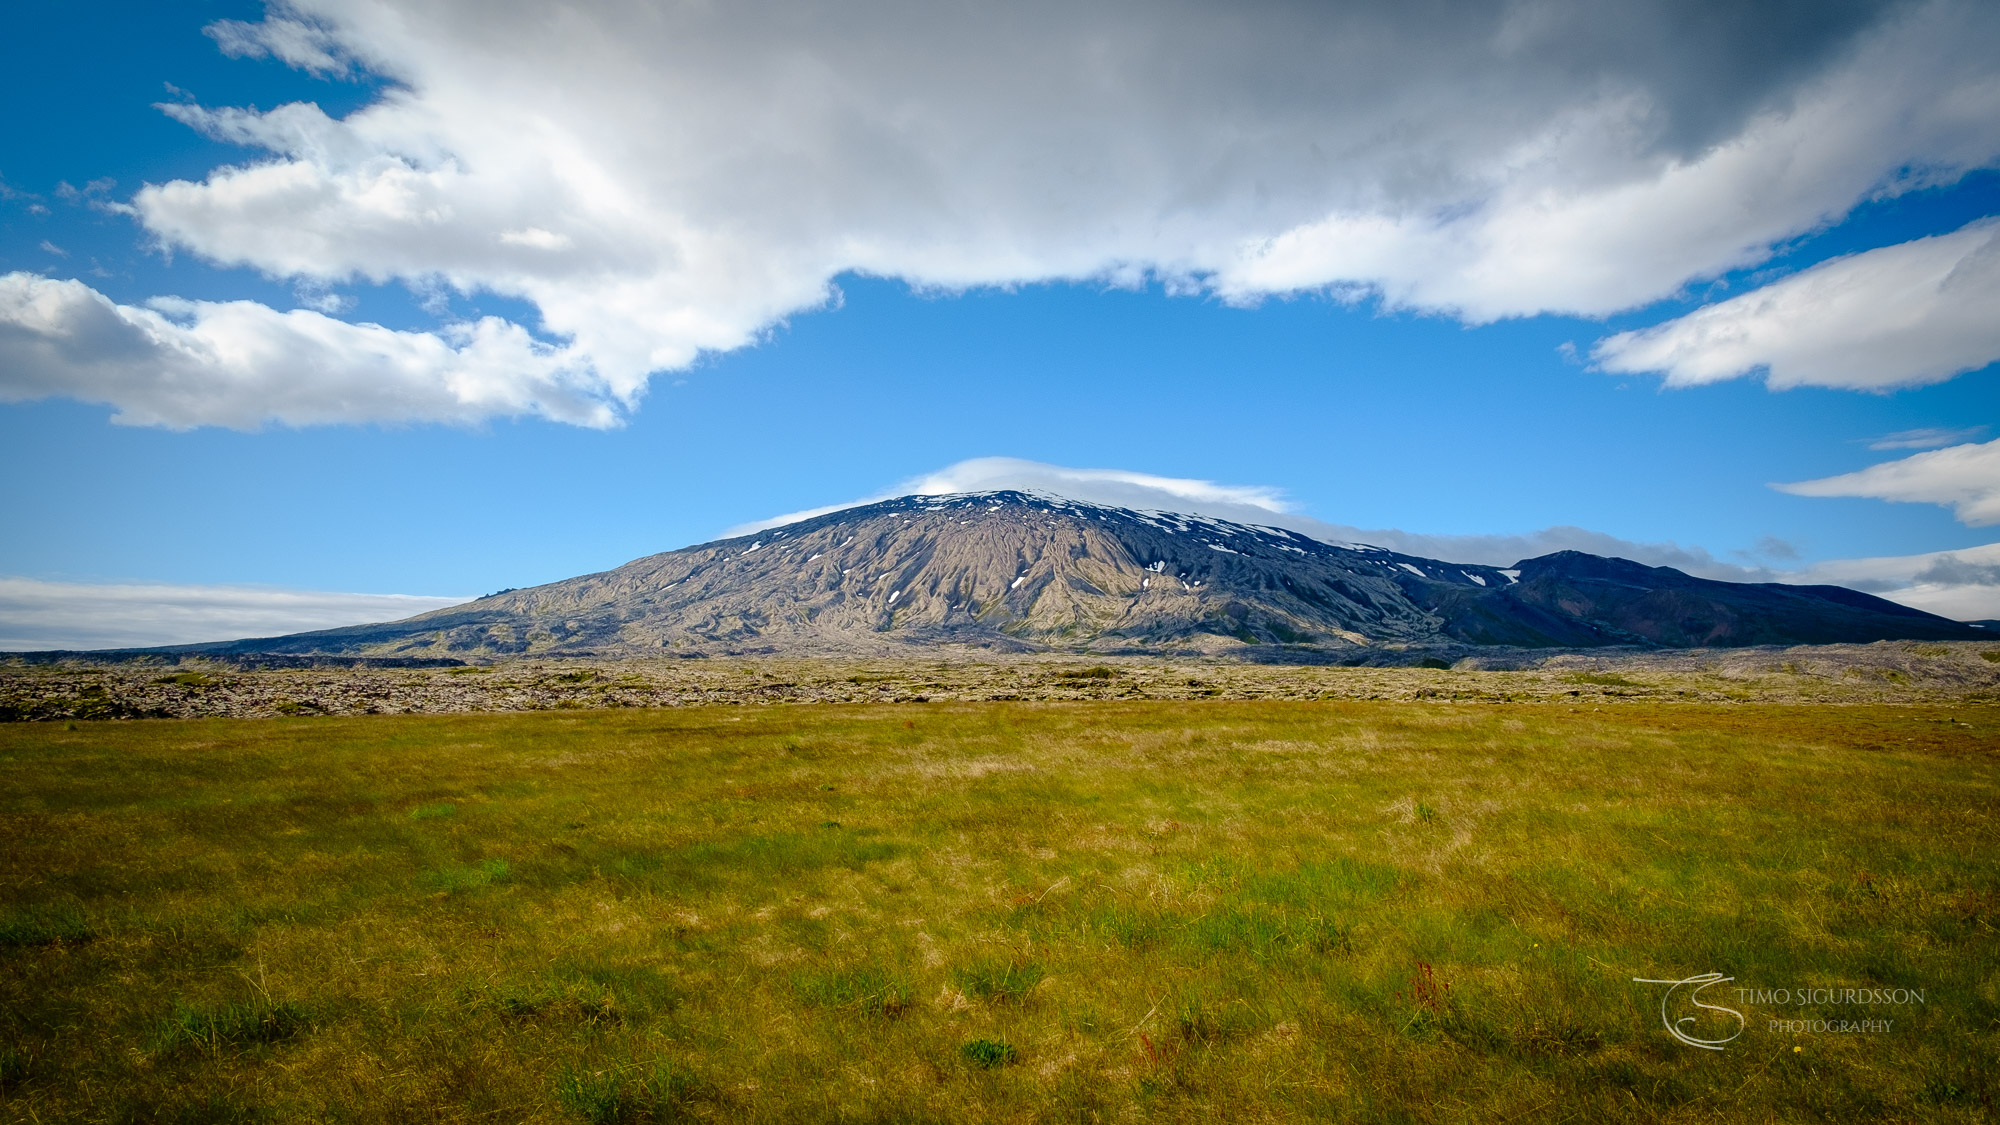 Snæfellsjökull, Iceland. Glacier mountain. Snæfellsnes peninsula.